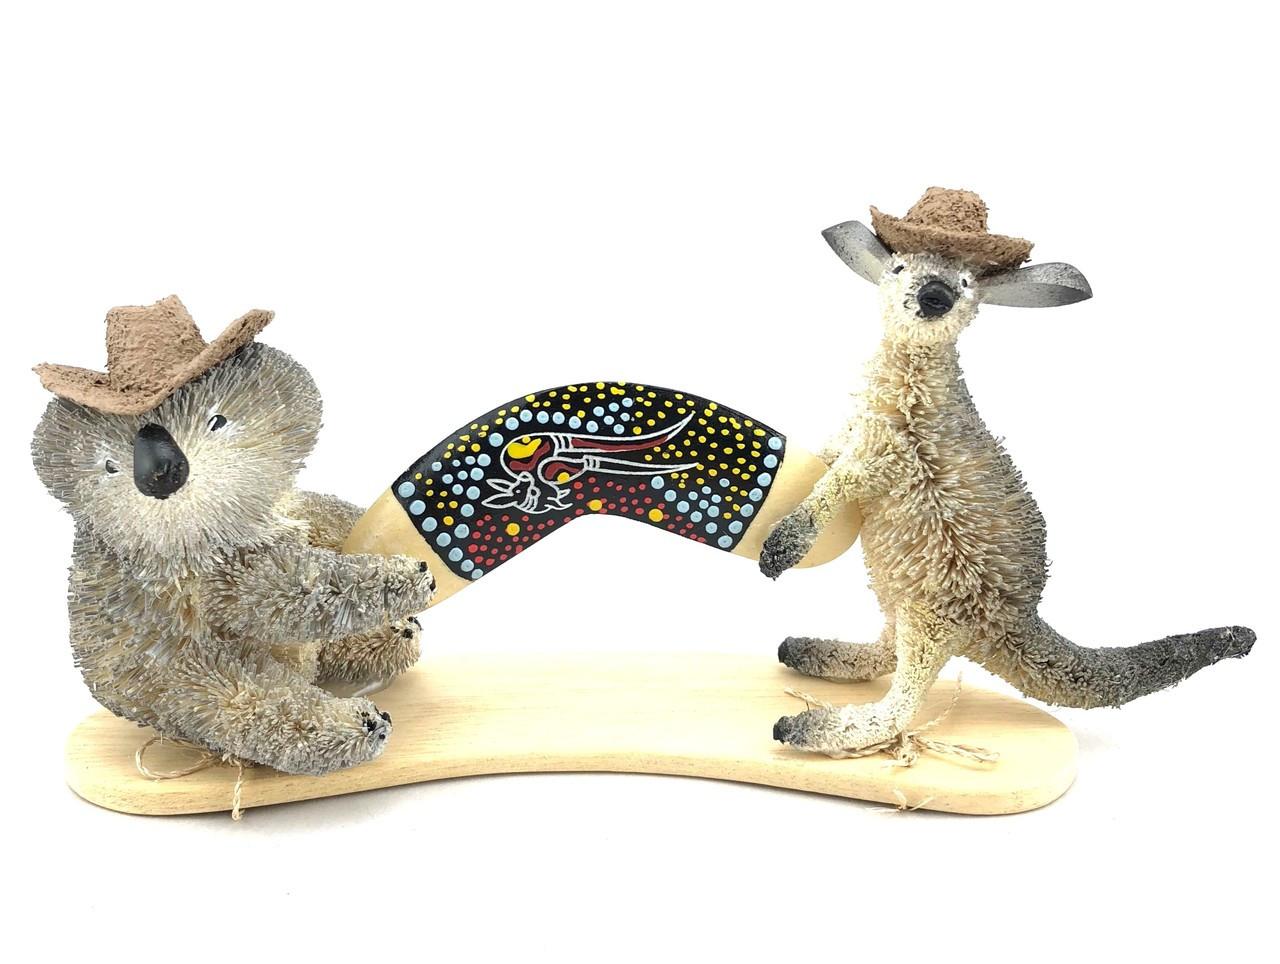 Aussie Kangaroo and Koala Boomerang 9cm high x